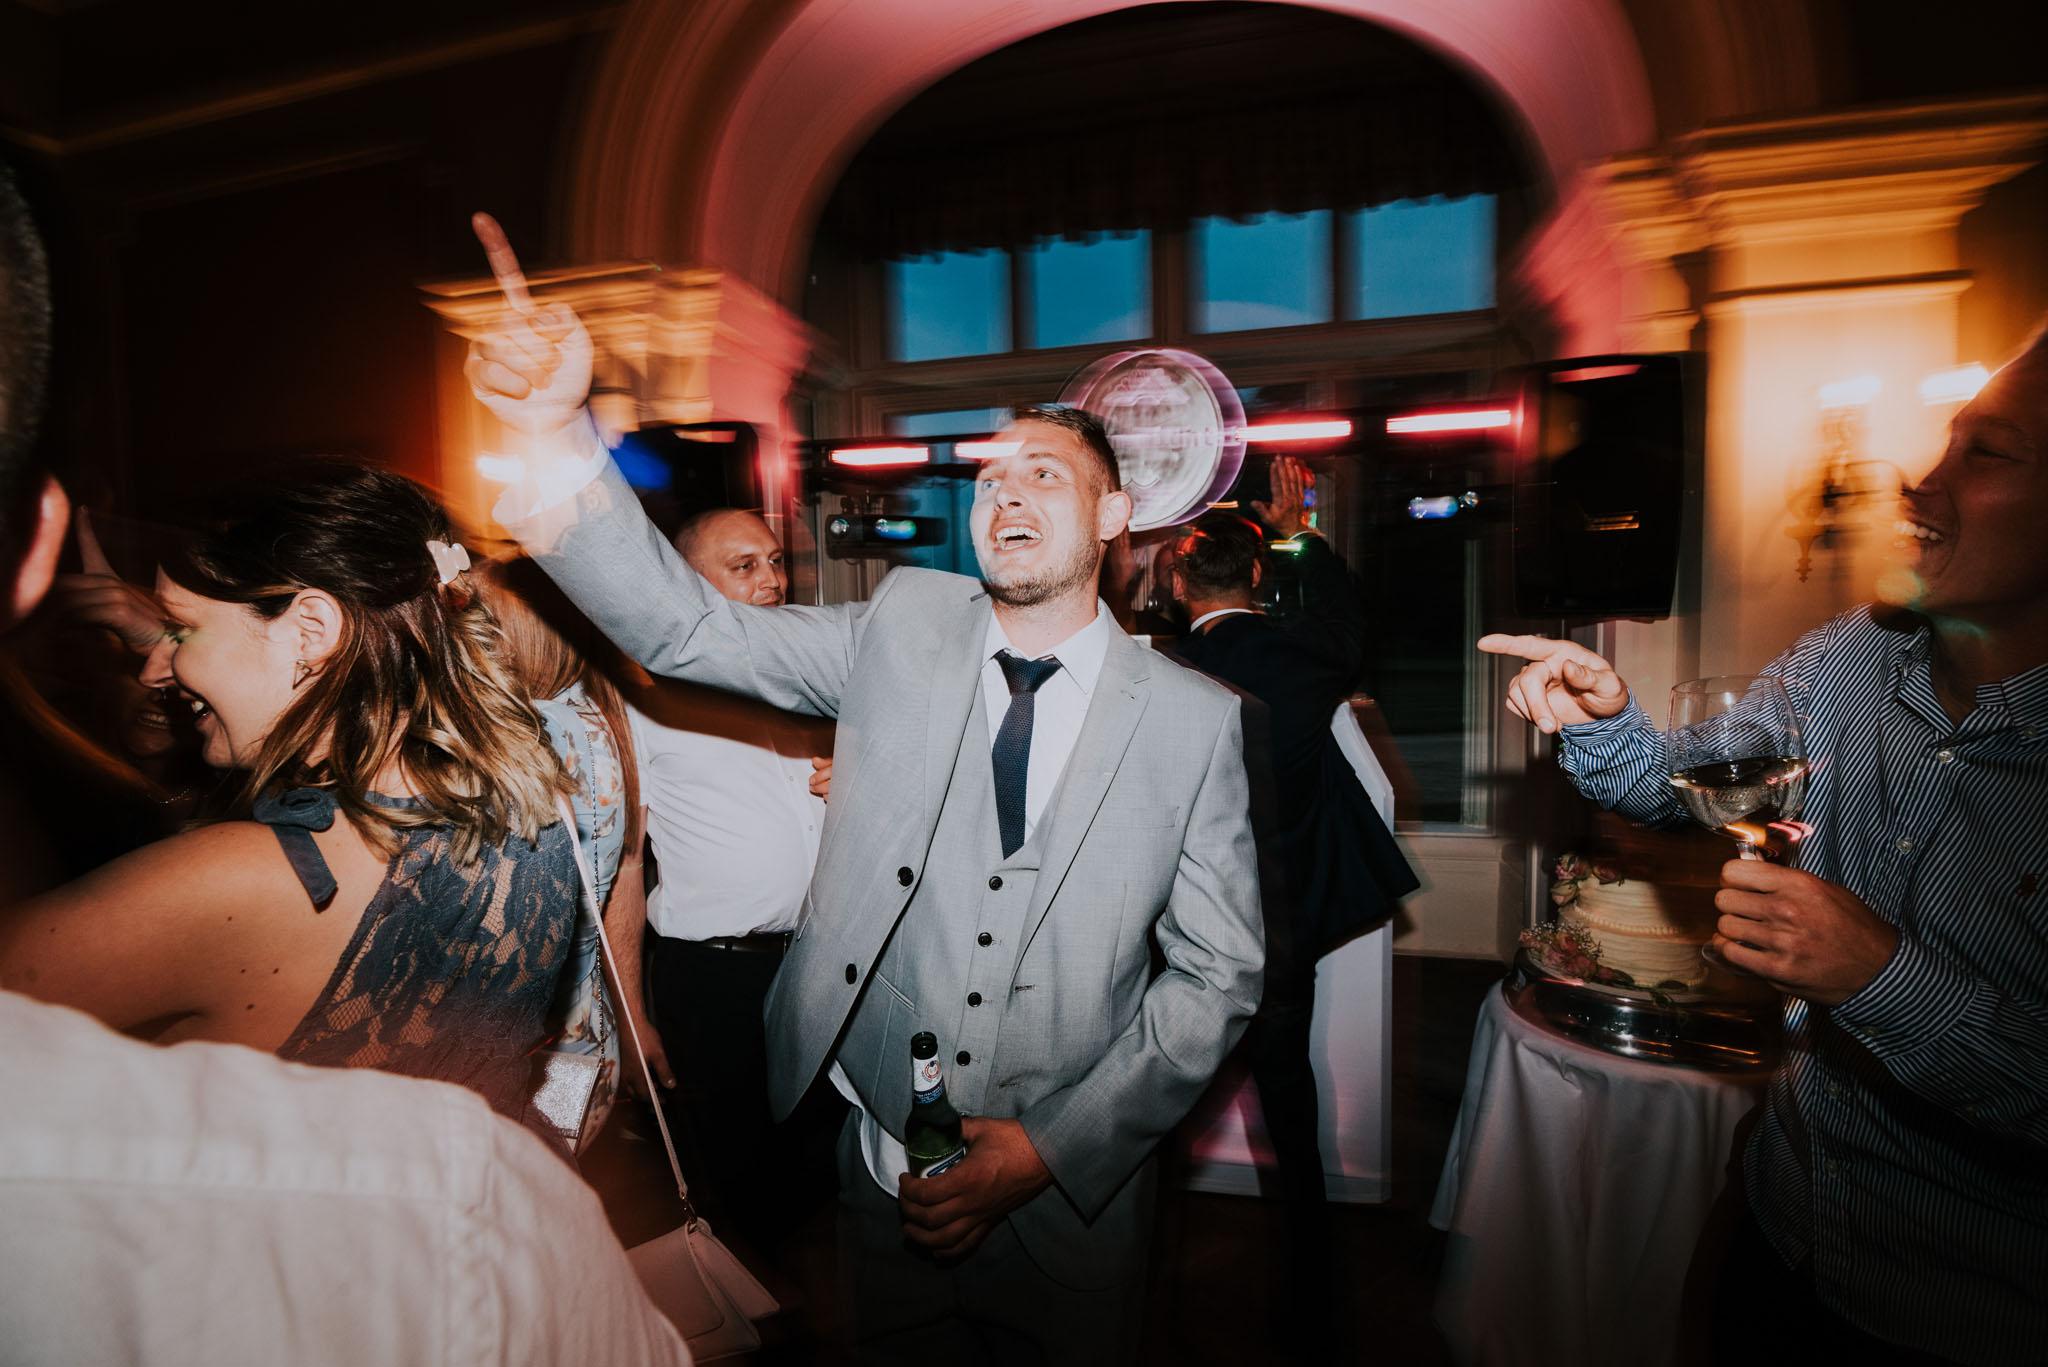 wedding-photographer-glewstone-court-hereford-scott-stockwell-photography485.jpg